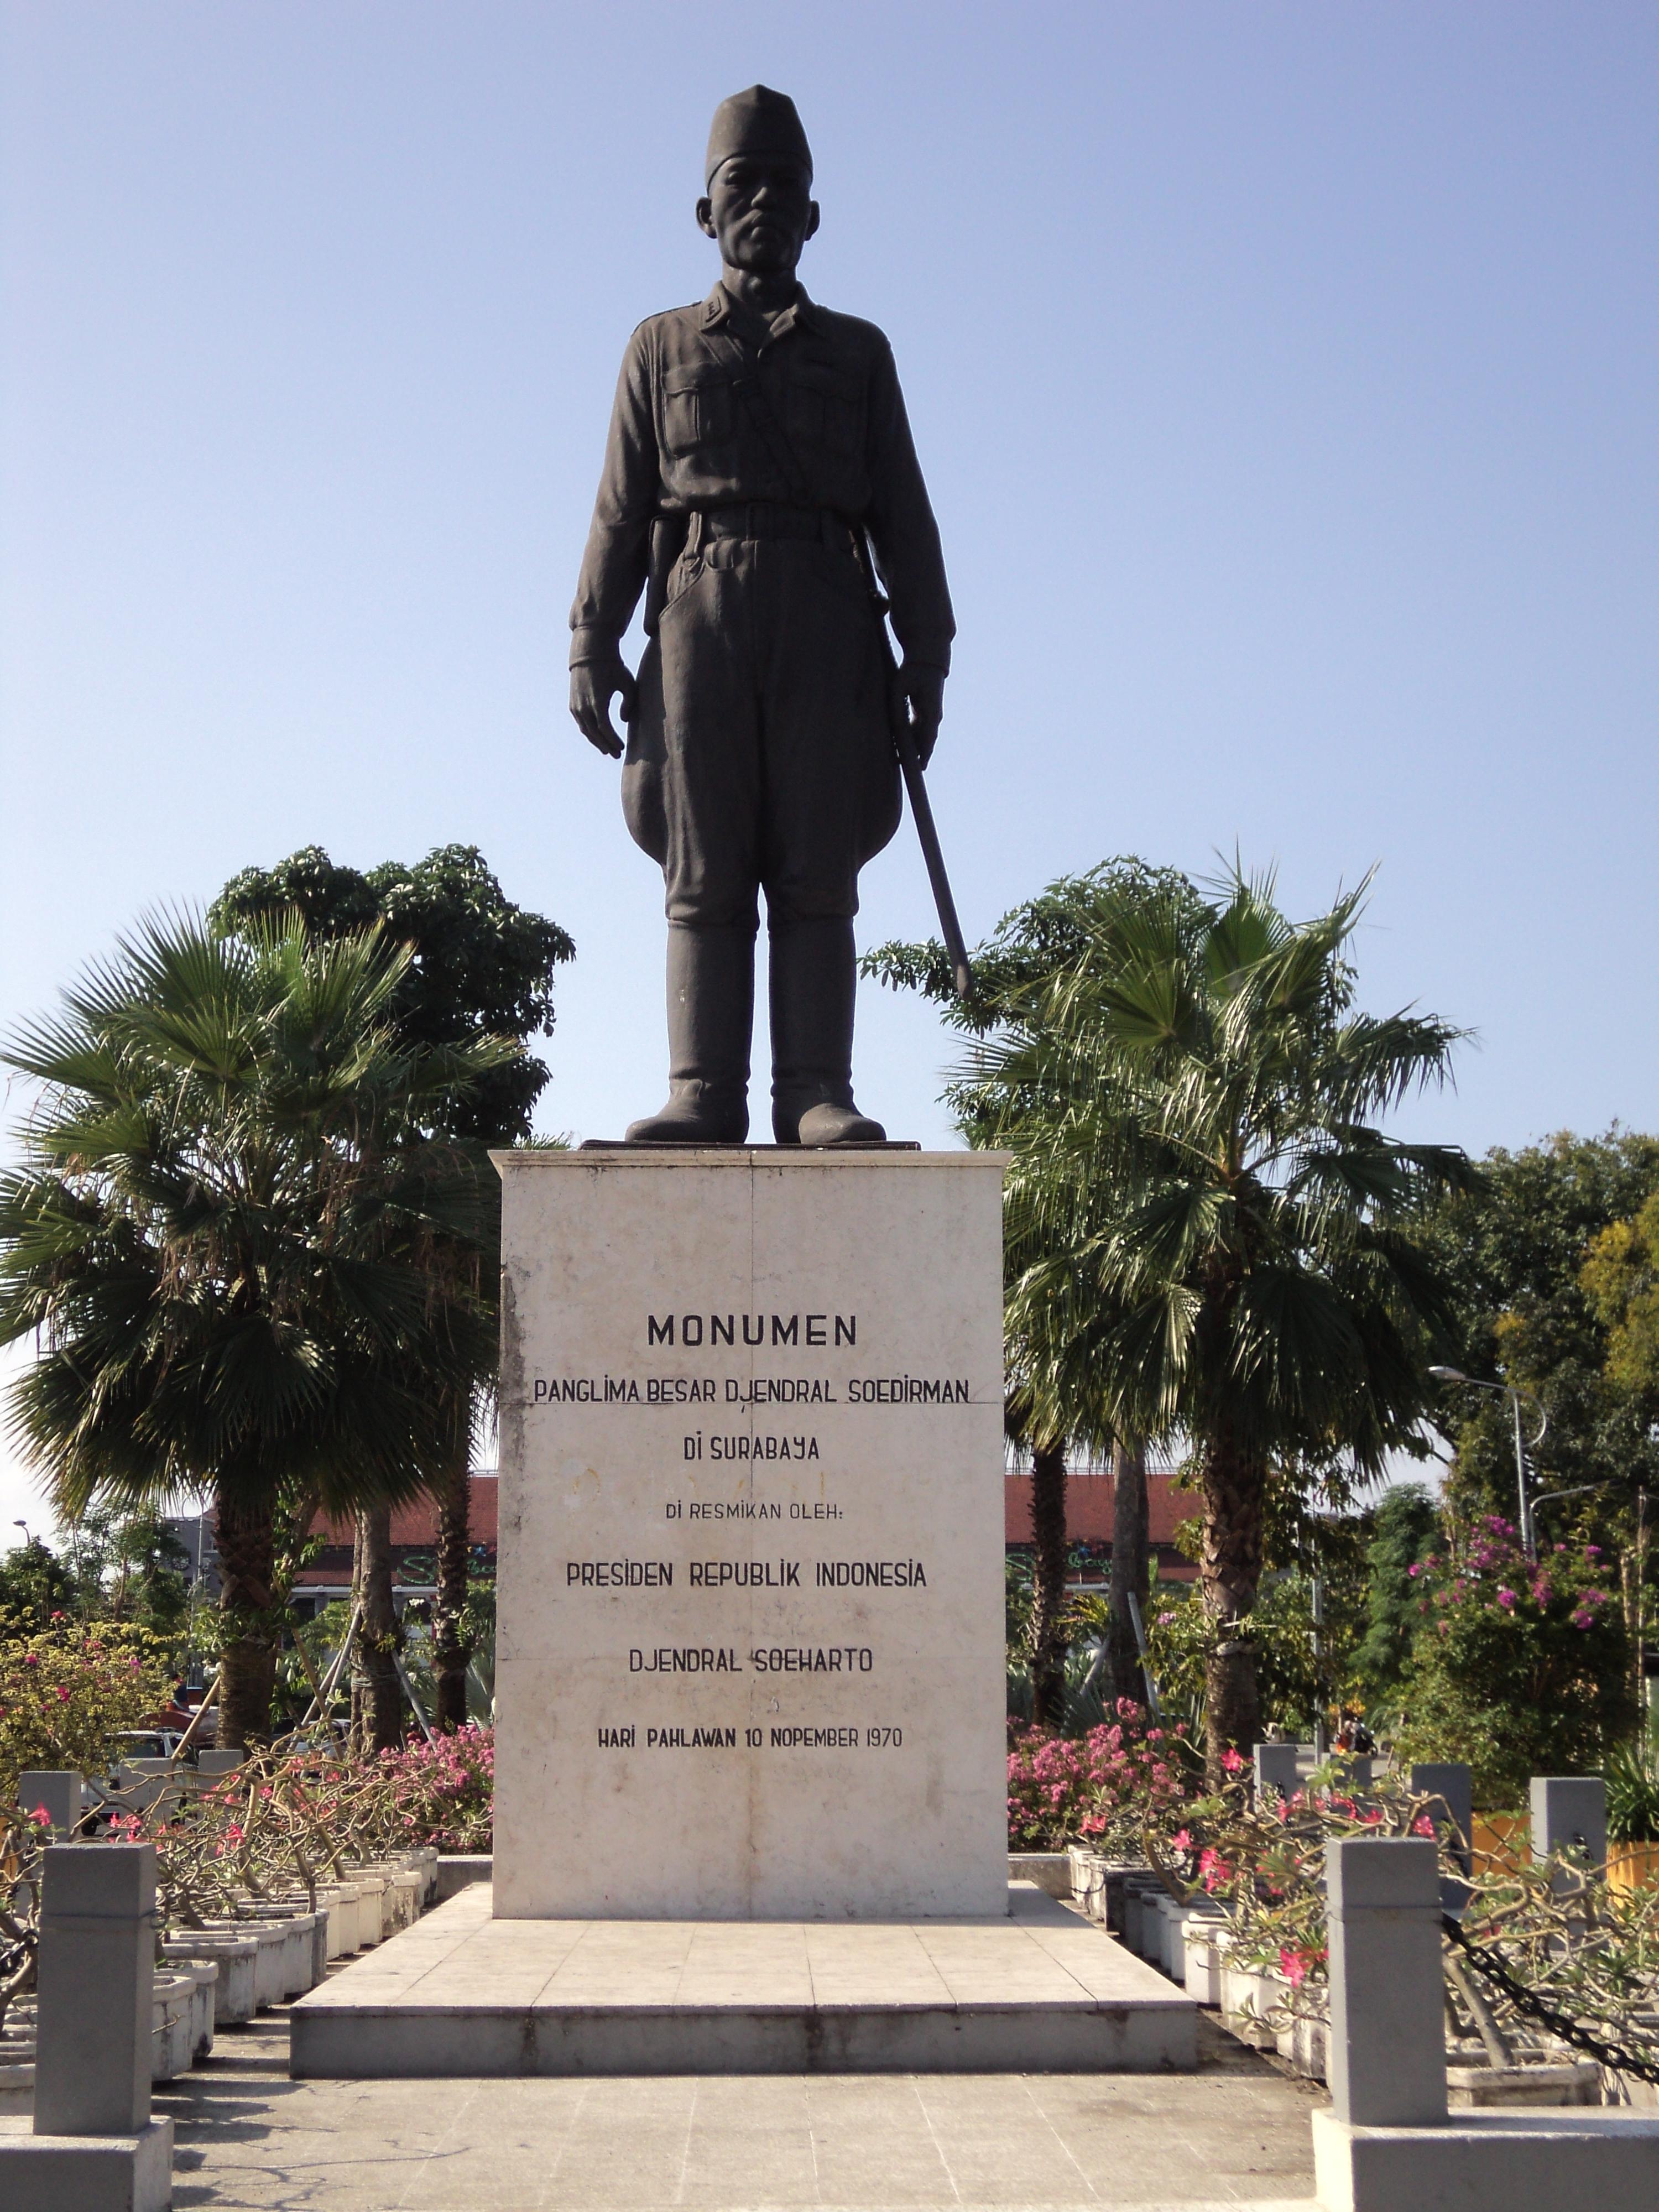 Gambar Untuk Monumen  Monumen Surabaya